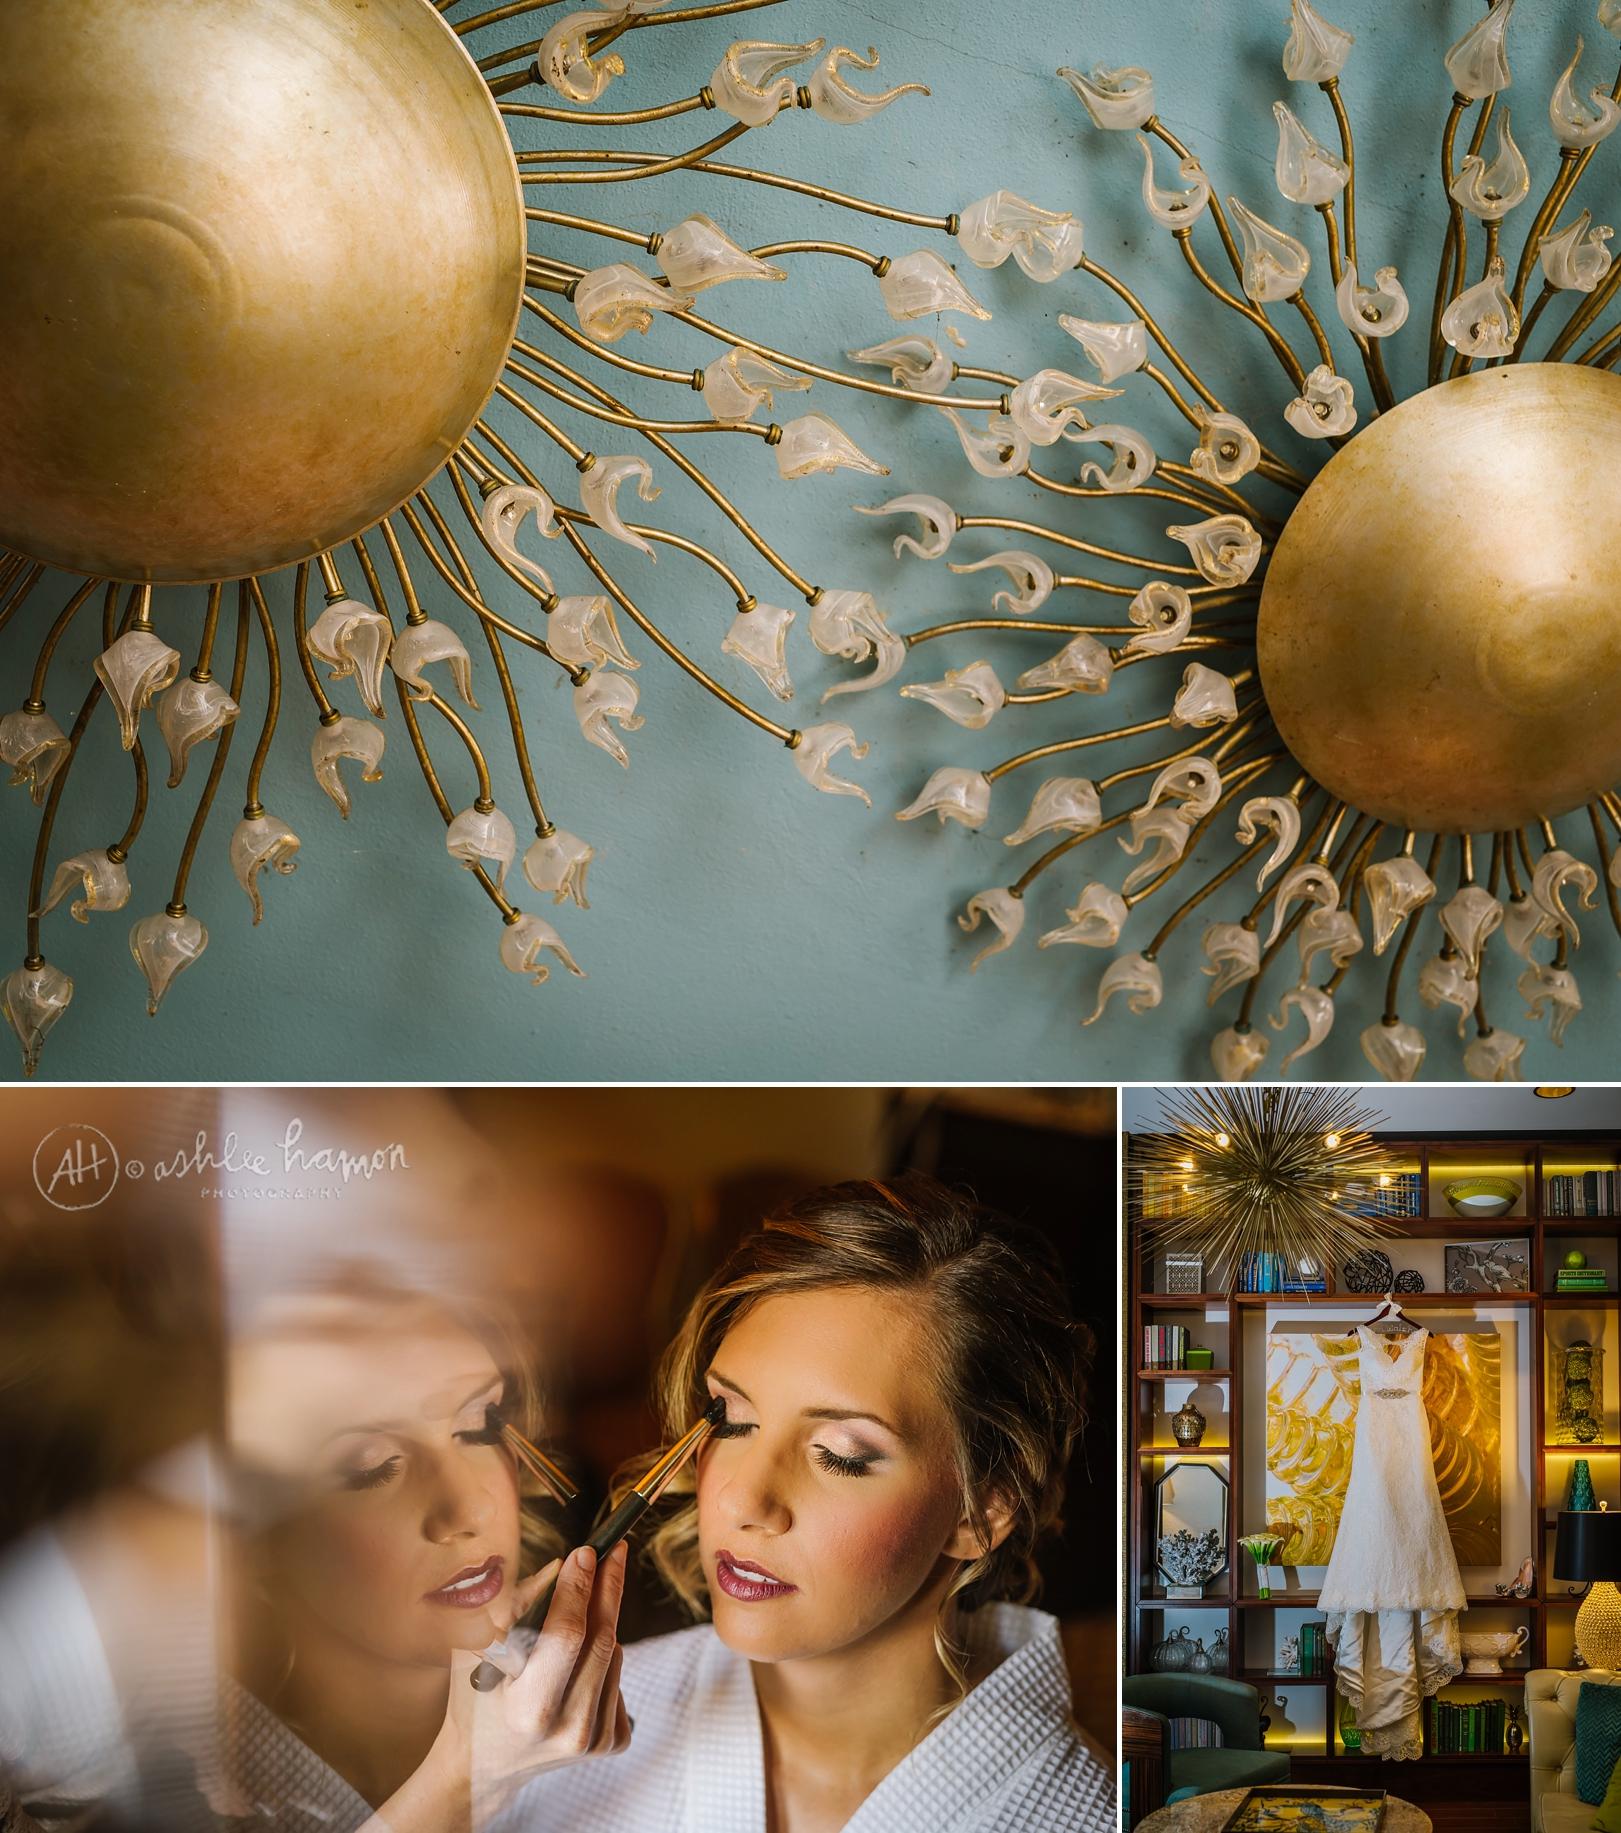 st-pete-art-museum-wedding-vinoy-ashlee-hamon-photography_0000.jpg